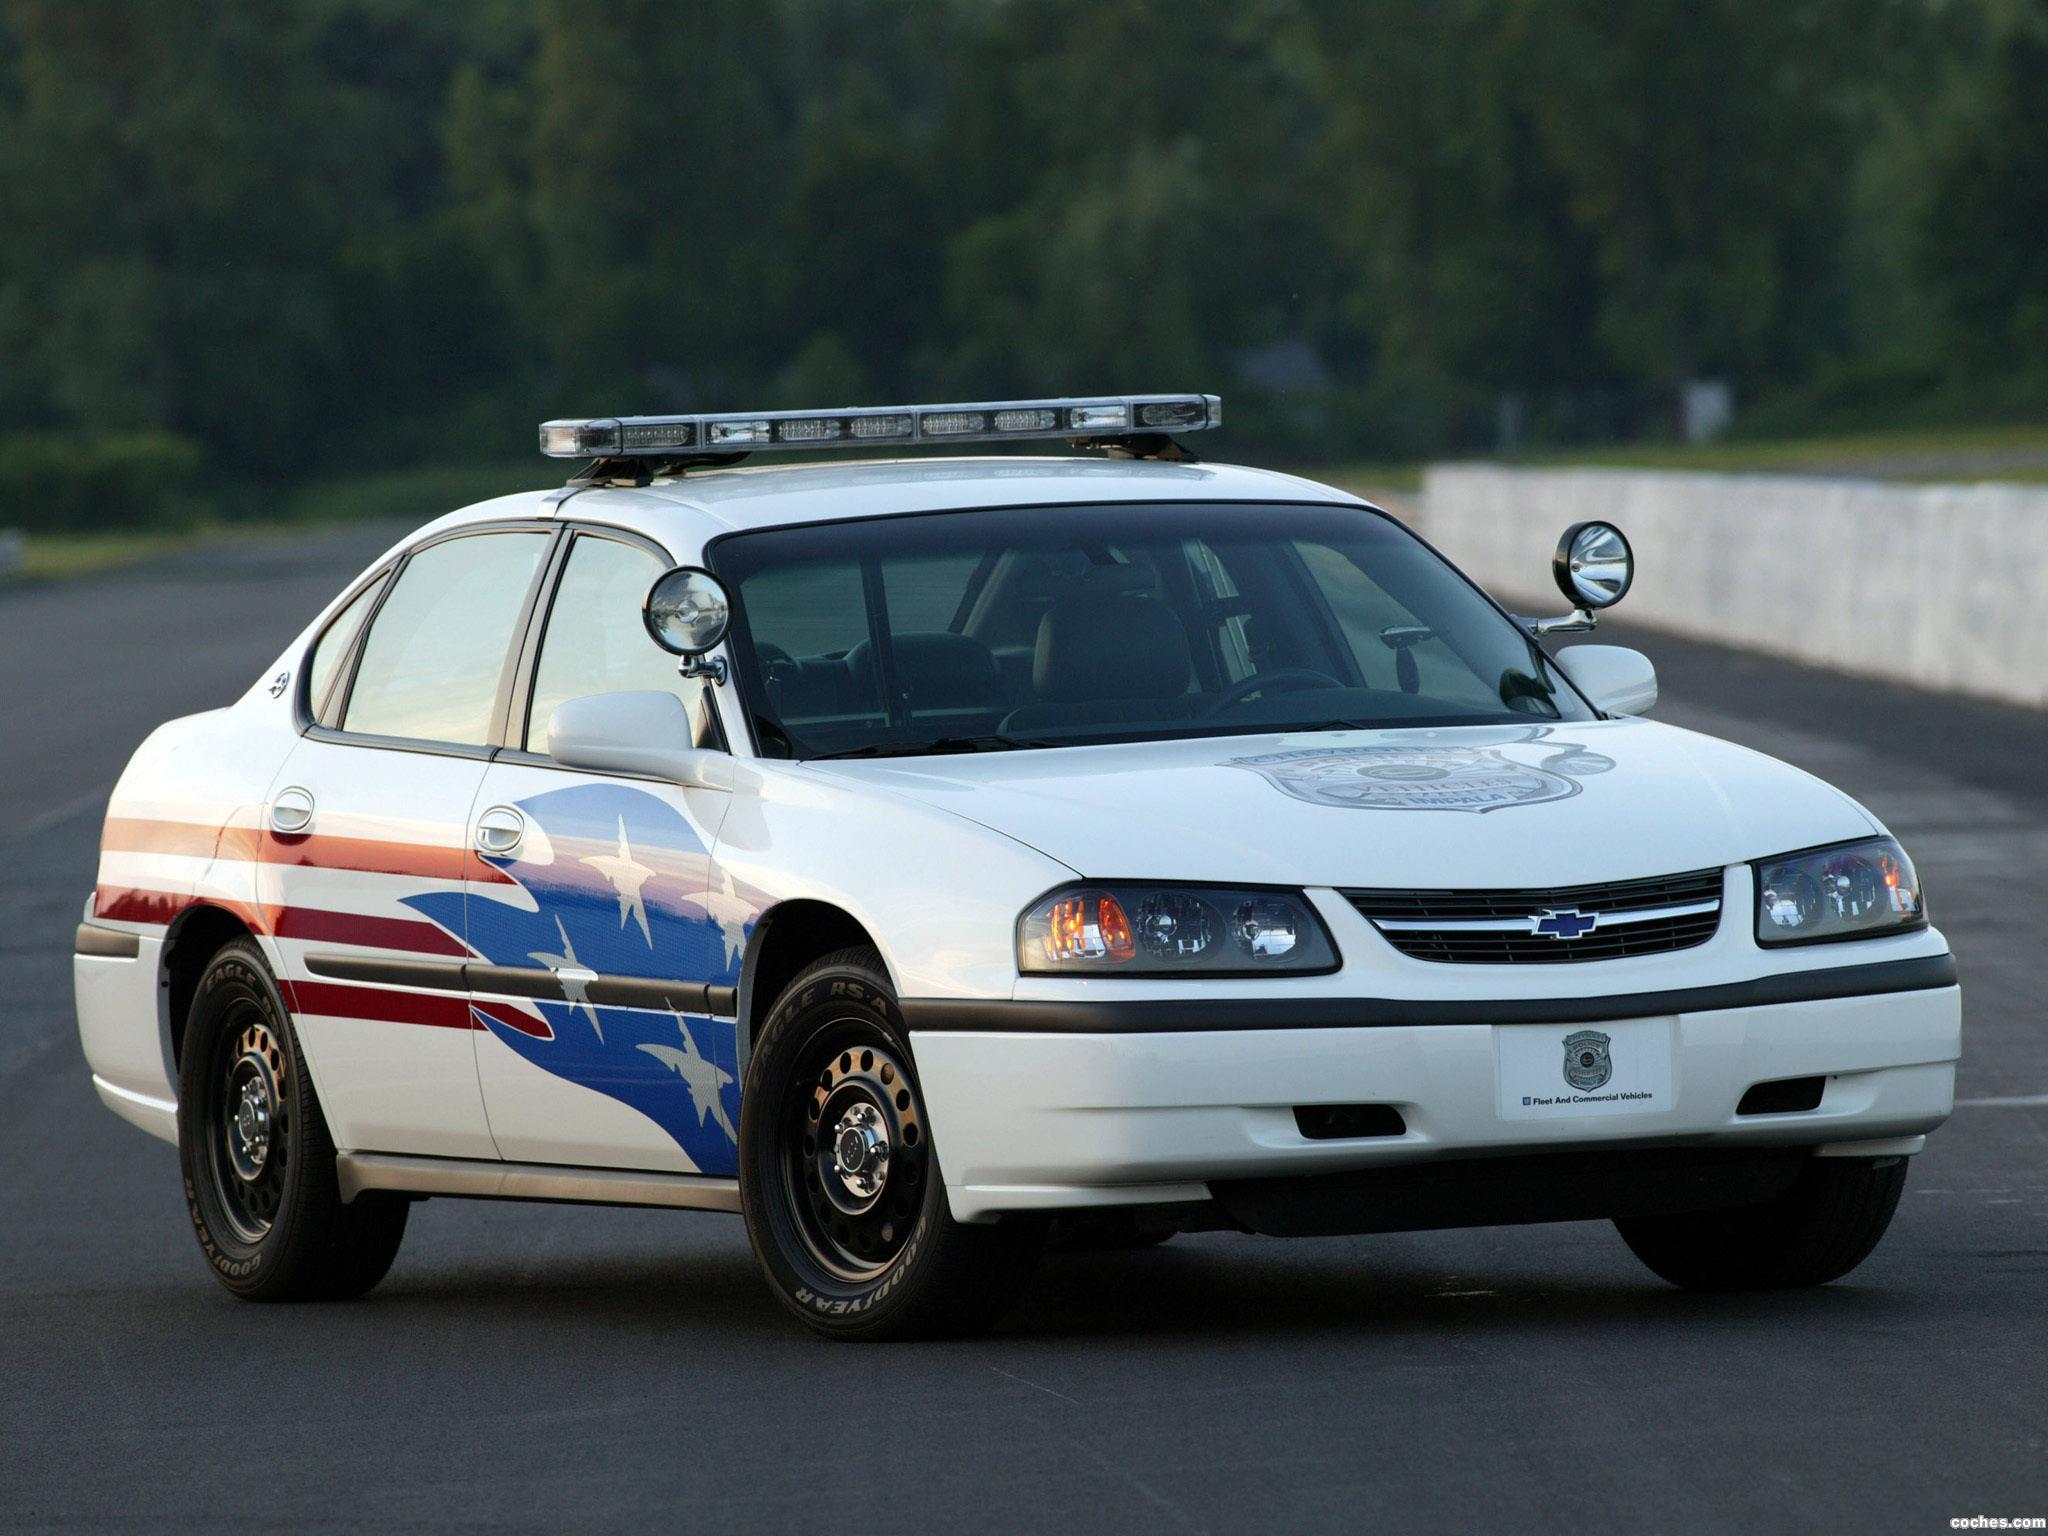 Foto 0 de Chevrolet Impala Police 2001